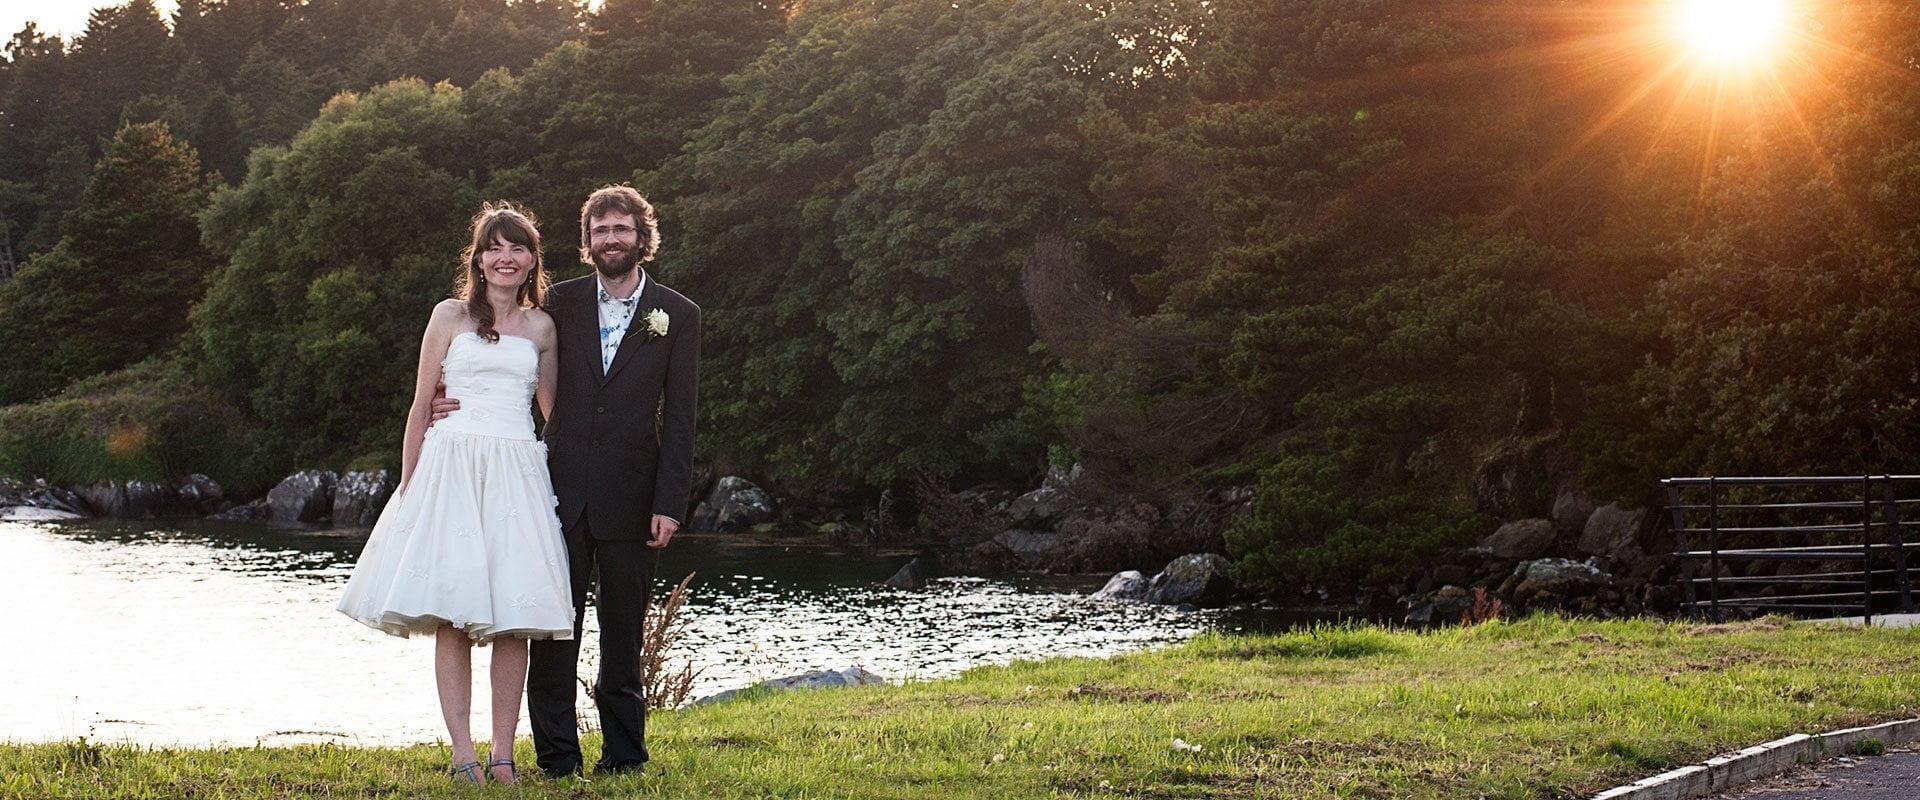 Documentary Wedding Photography - Hertforshire/London/Glasgow